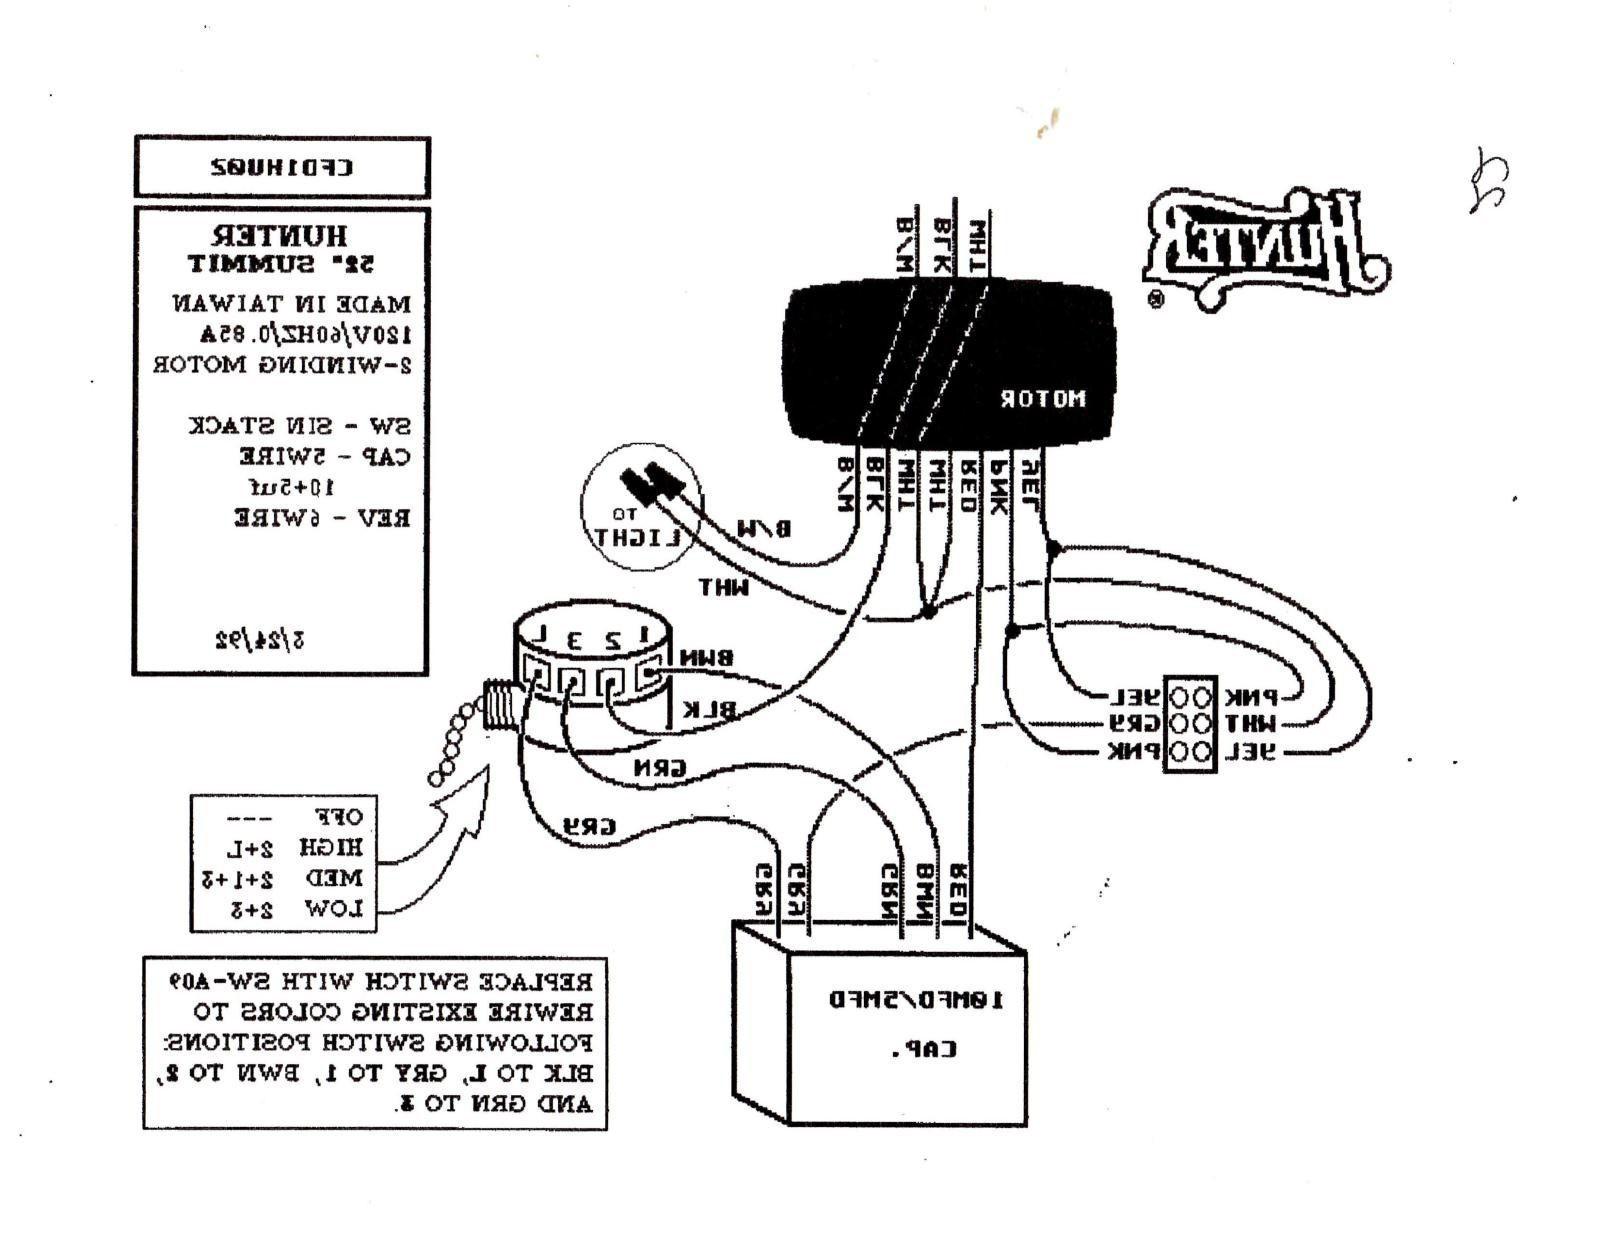 Hampton Bay Ceiling Fan Switch Wiring Diagram Best Hampton Bay 3 Speed Ceiling Fan Switch